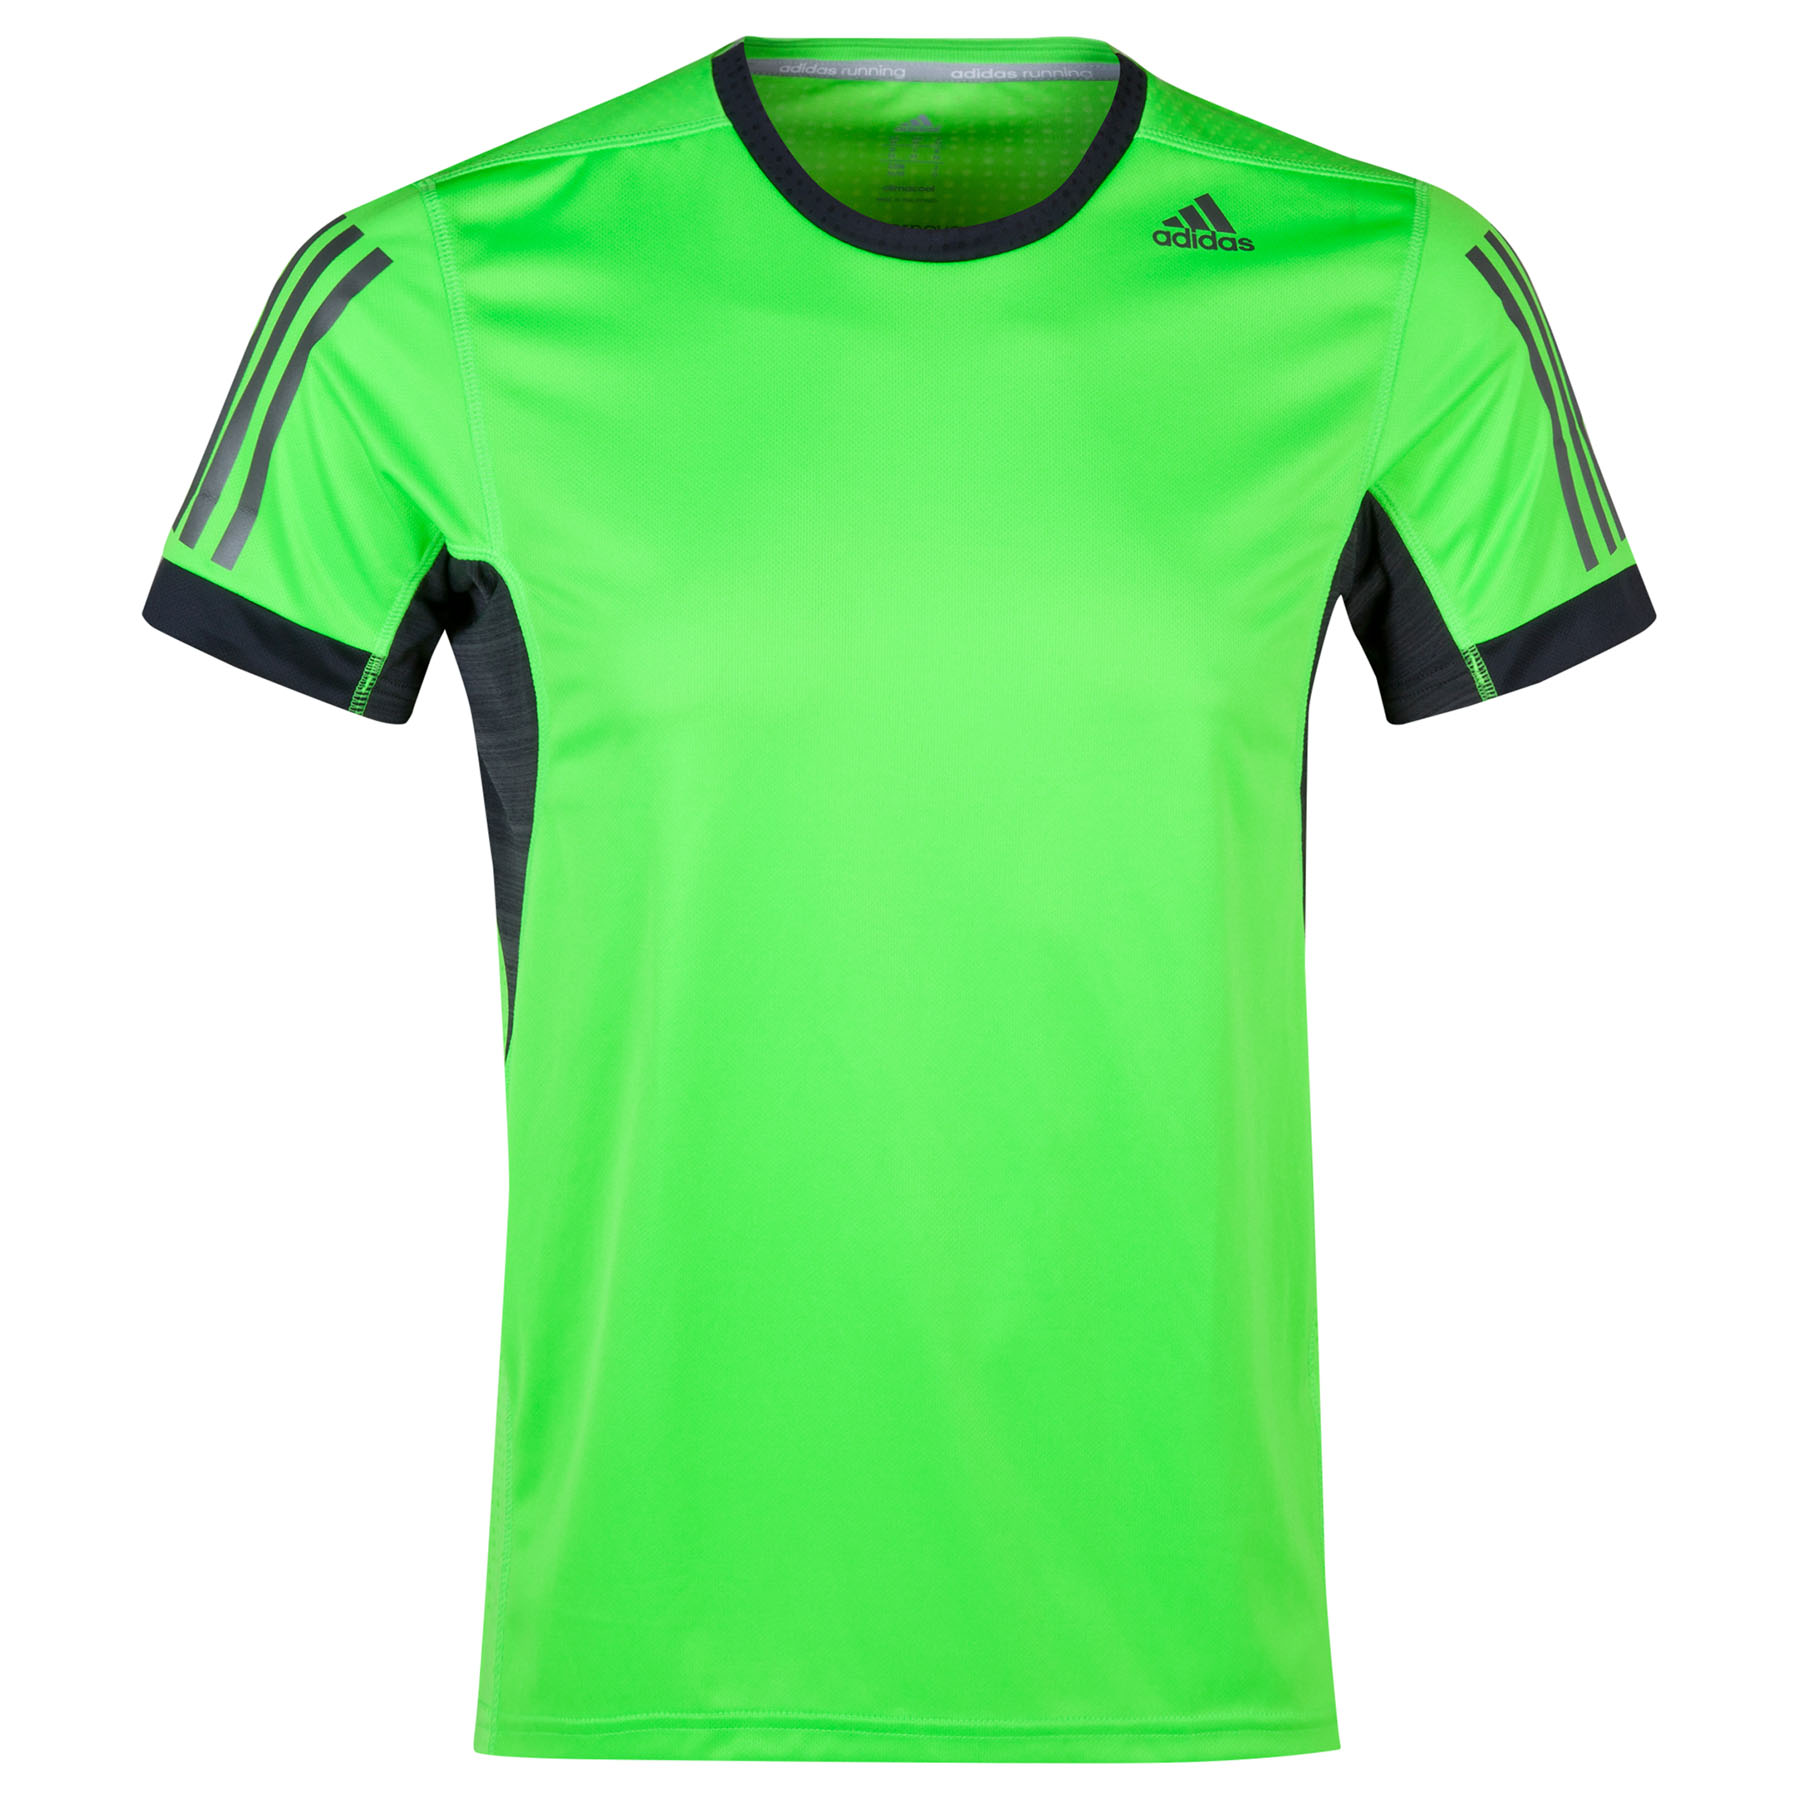 Adidas Supernova T-Shirt Lt Green